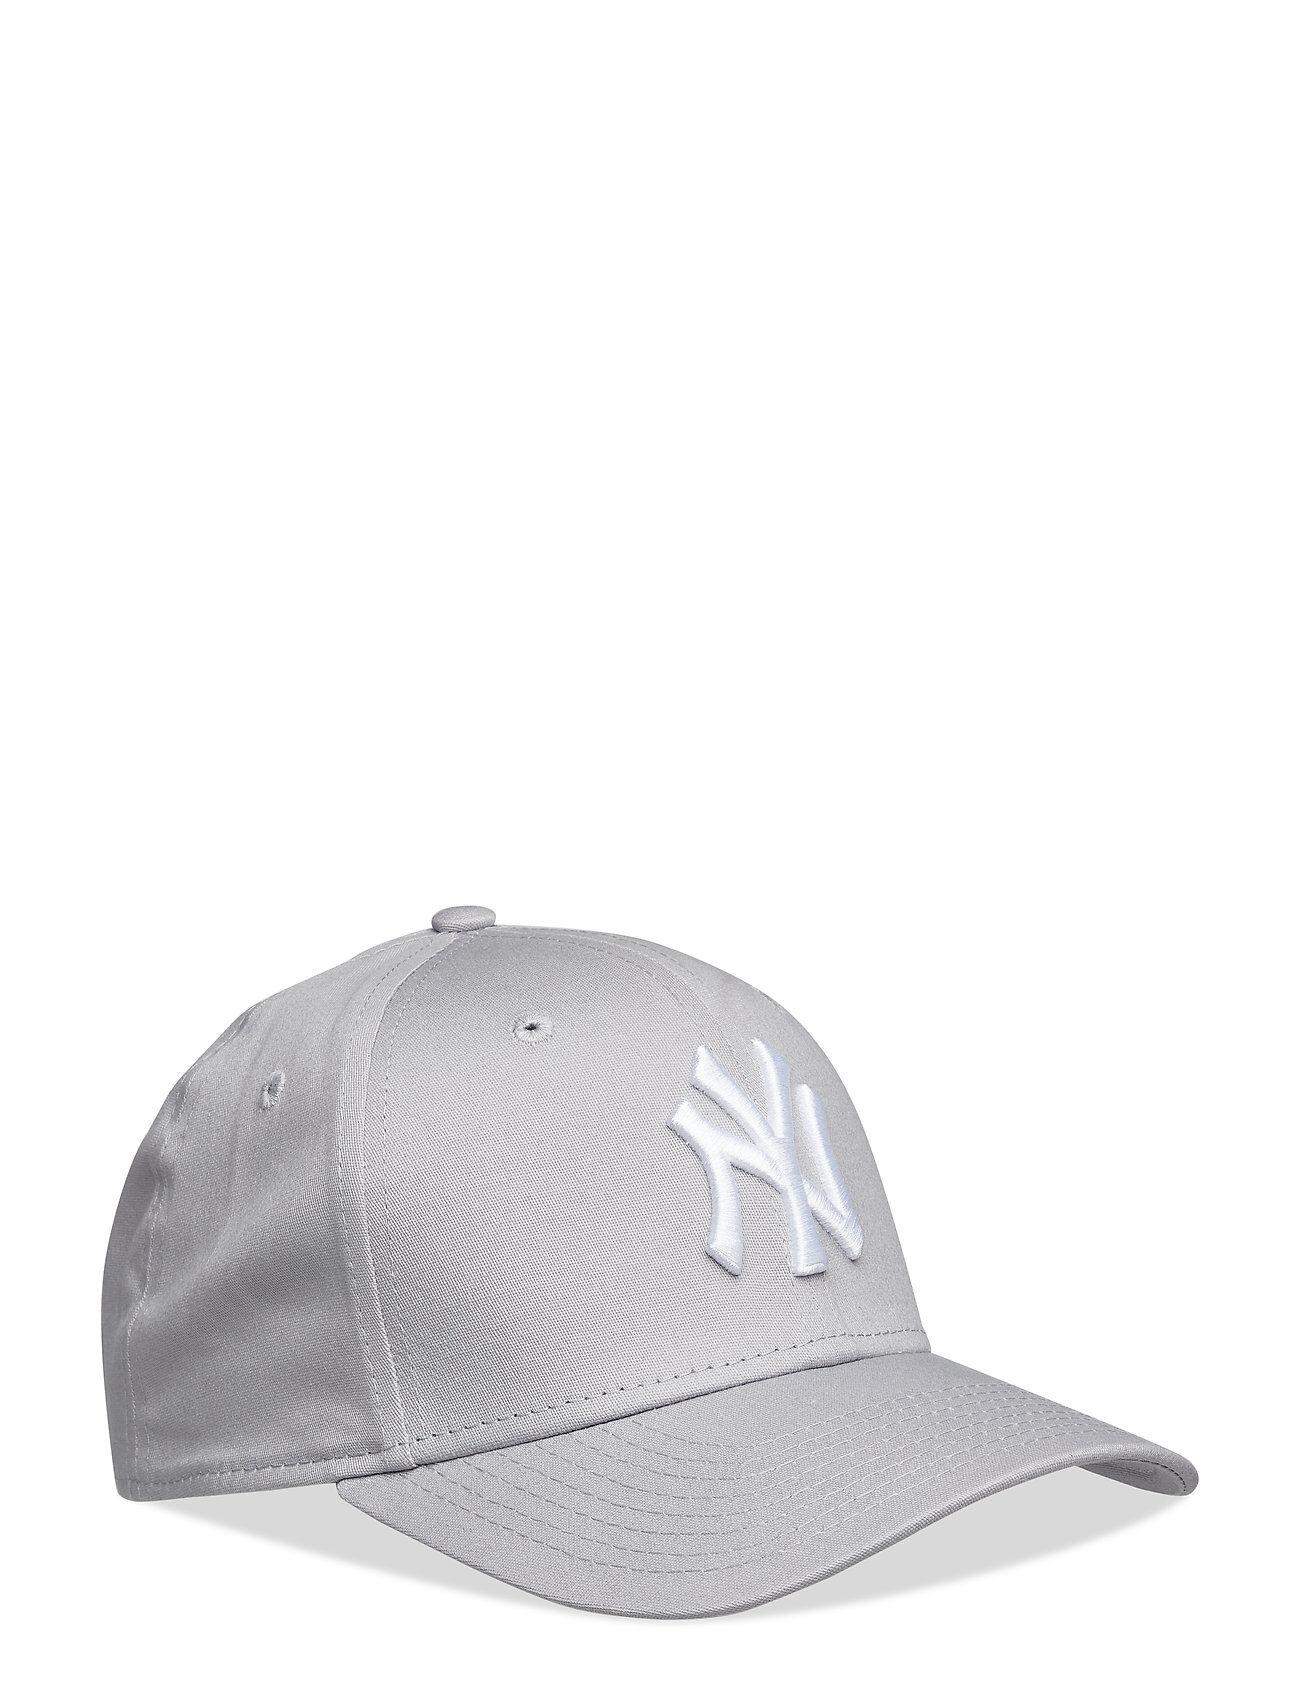 New Era Stretch Snap 9fifty Neyyan Accessories Headwear Caps Harmaa